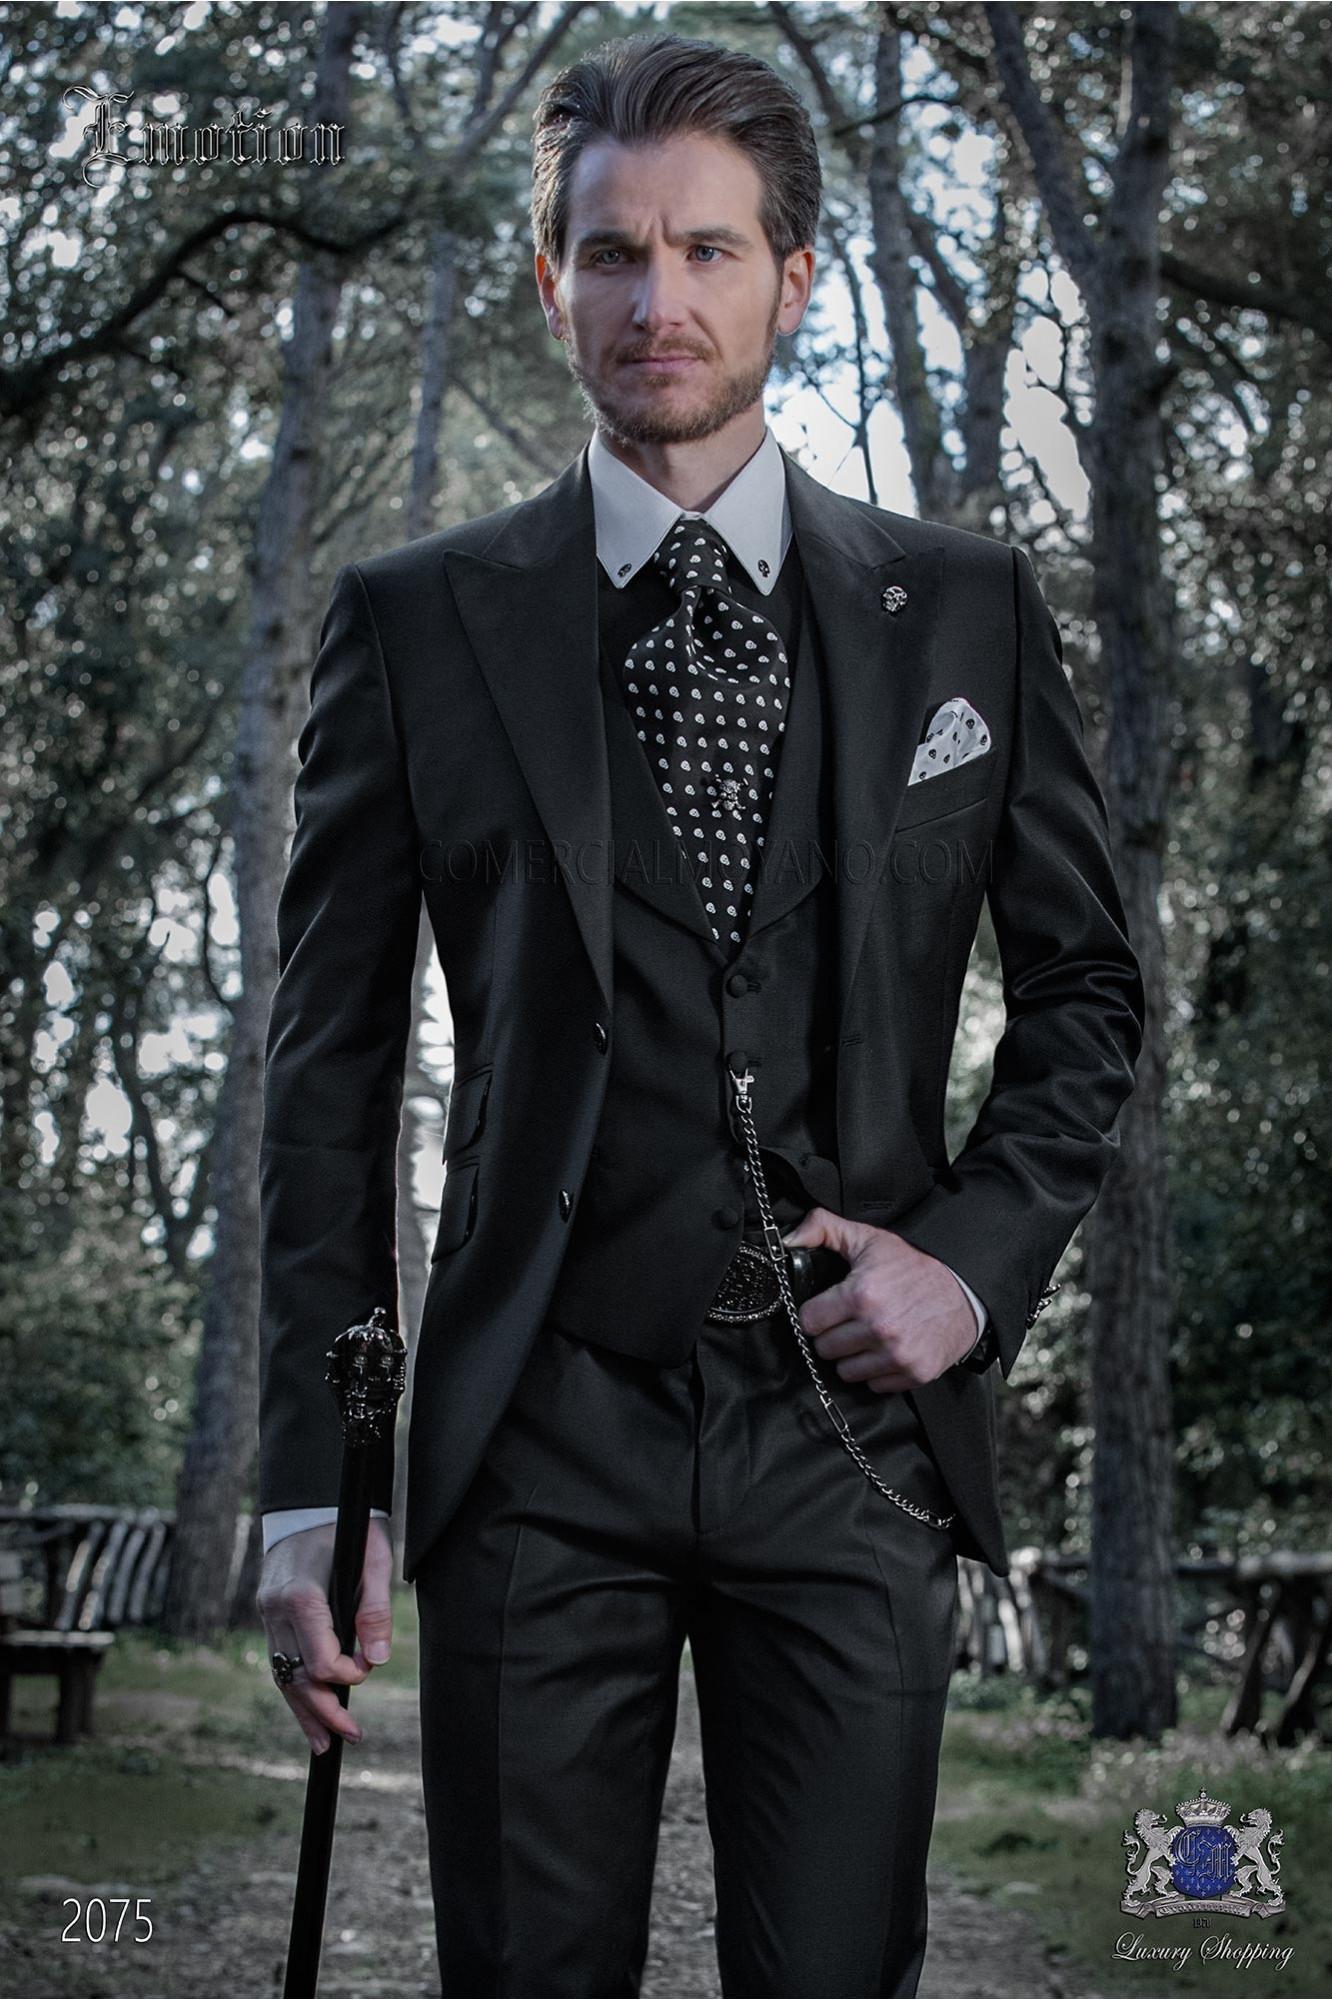 Traje de novio negro italiano moderno. Tejido pura lana.